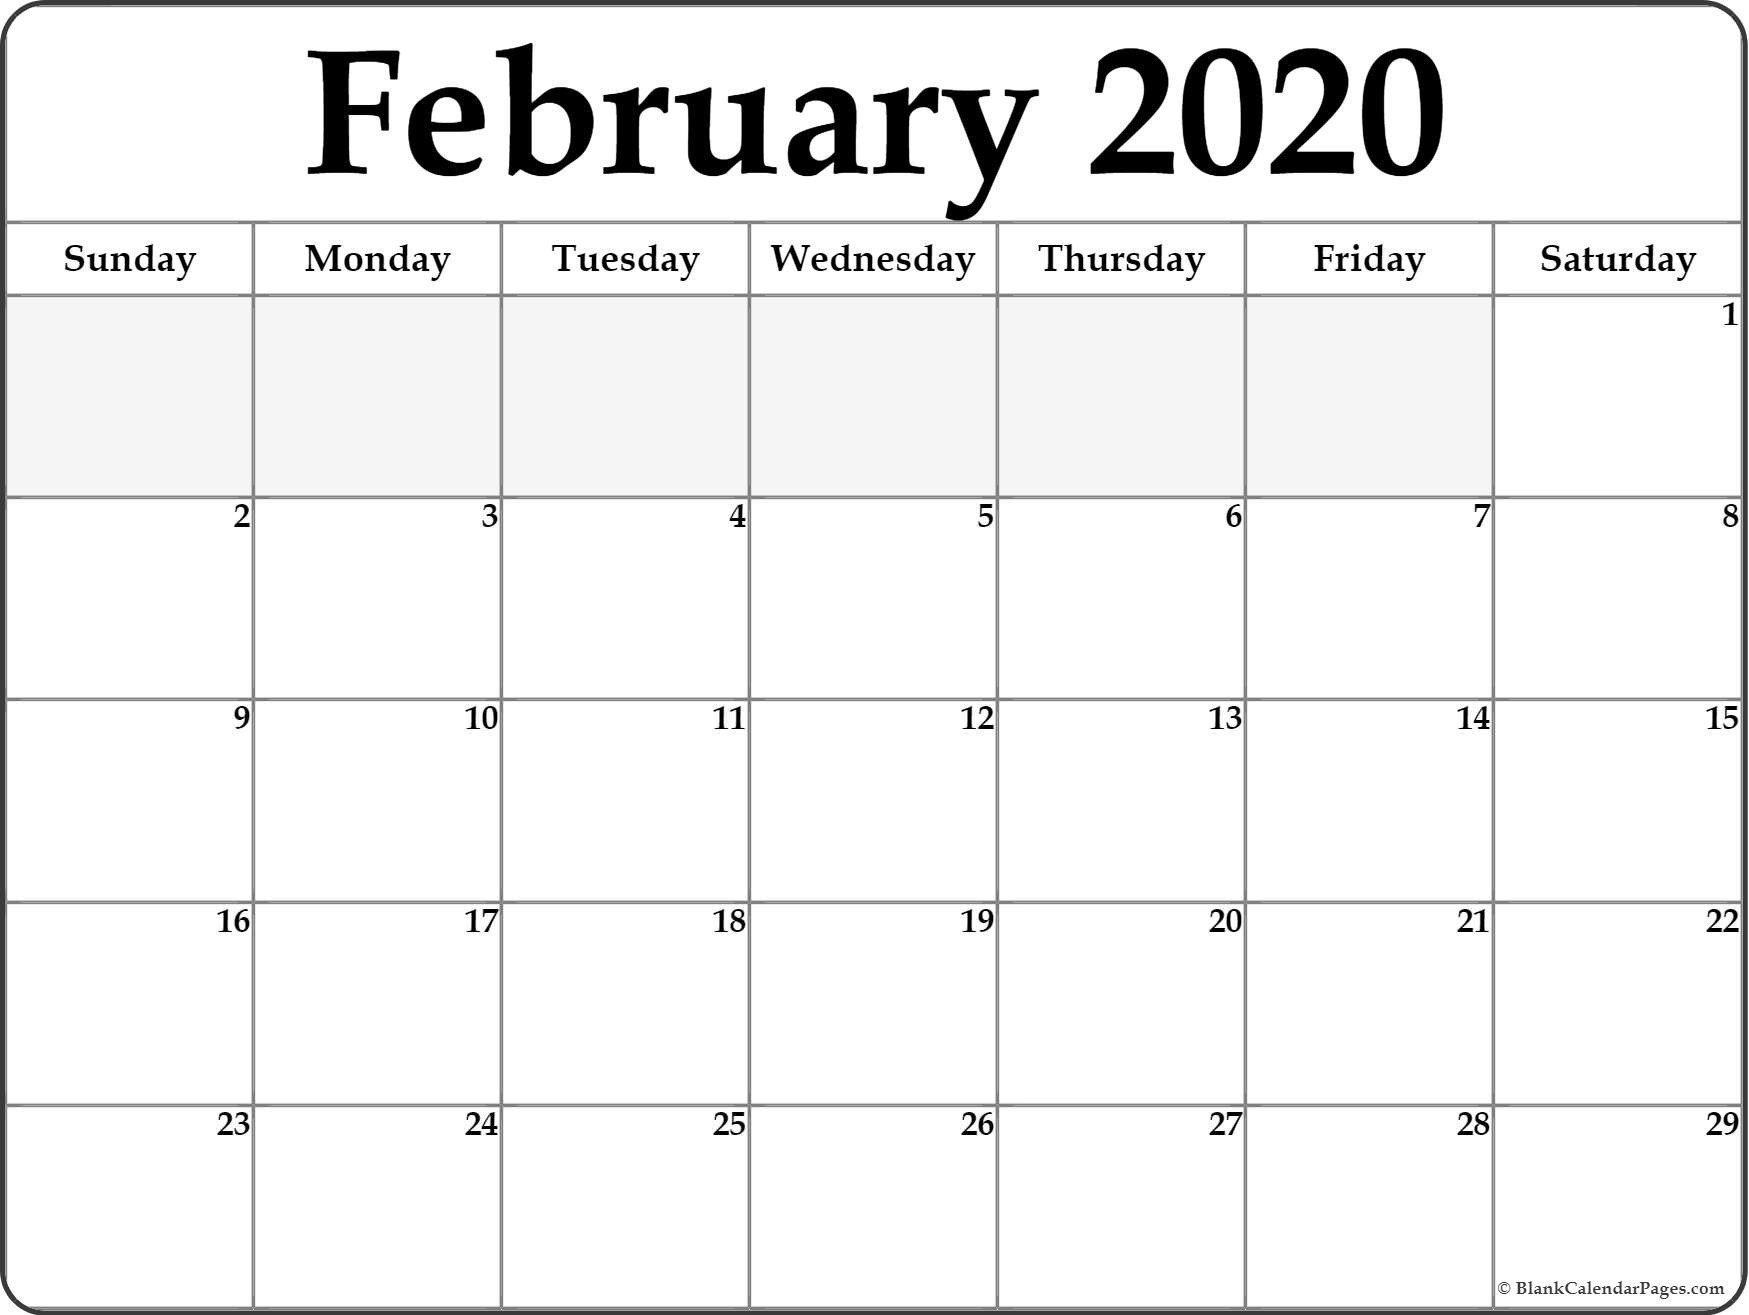 Blank Fill In Calendars 2020 Printable   Calendar Template Free Printable Fill In Calendars